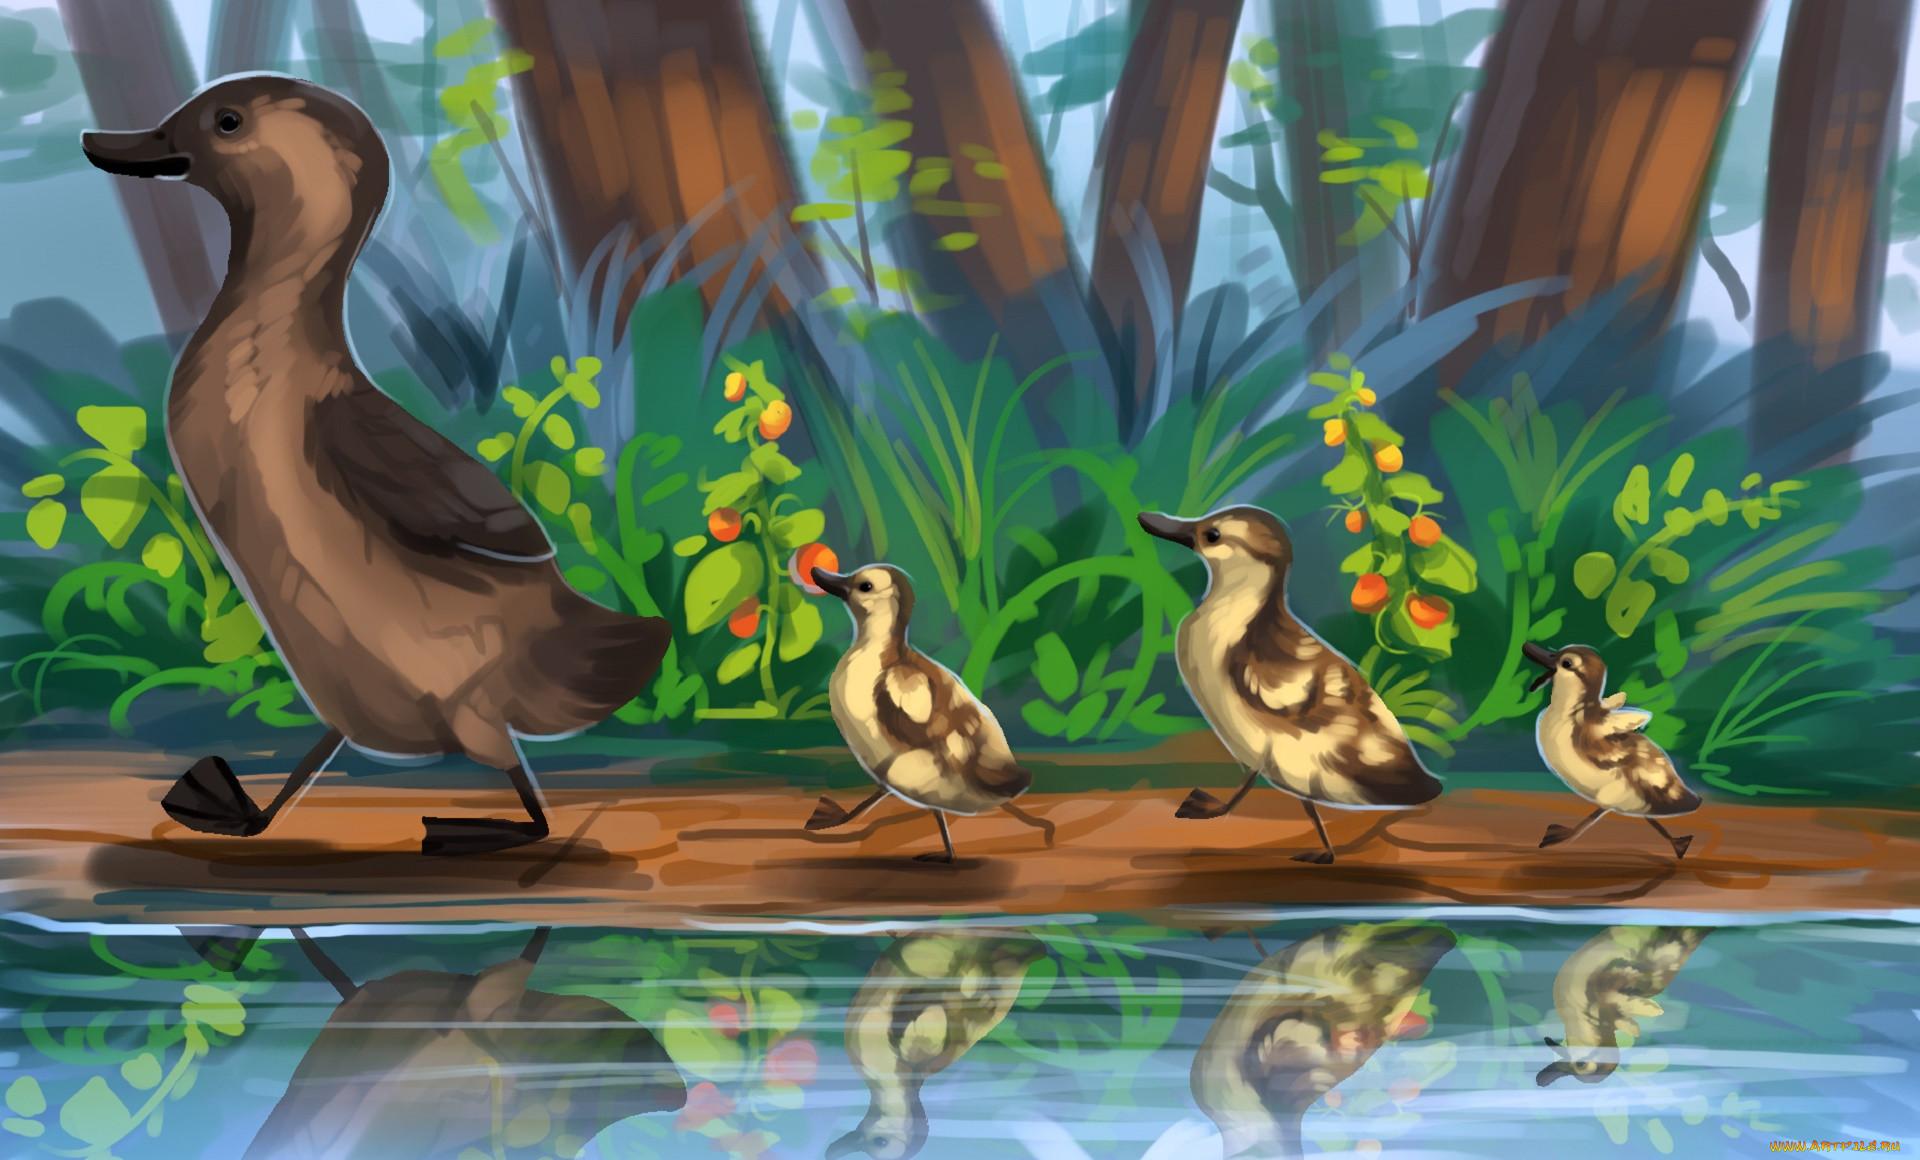 рисованное, животные, утка, утята, природа